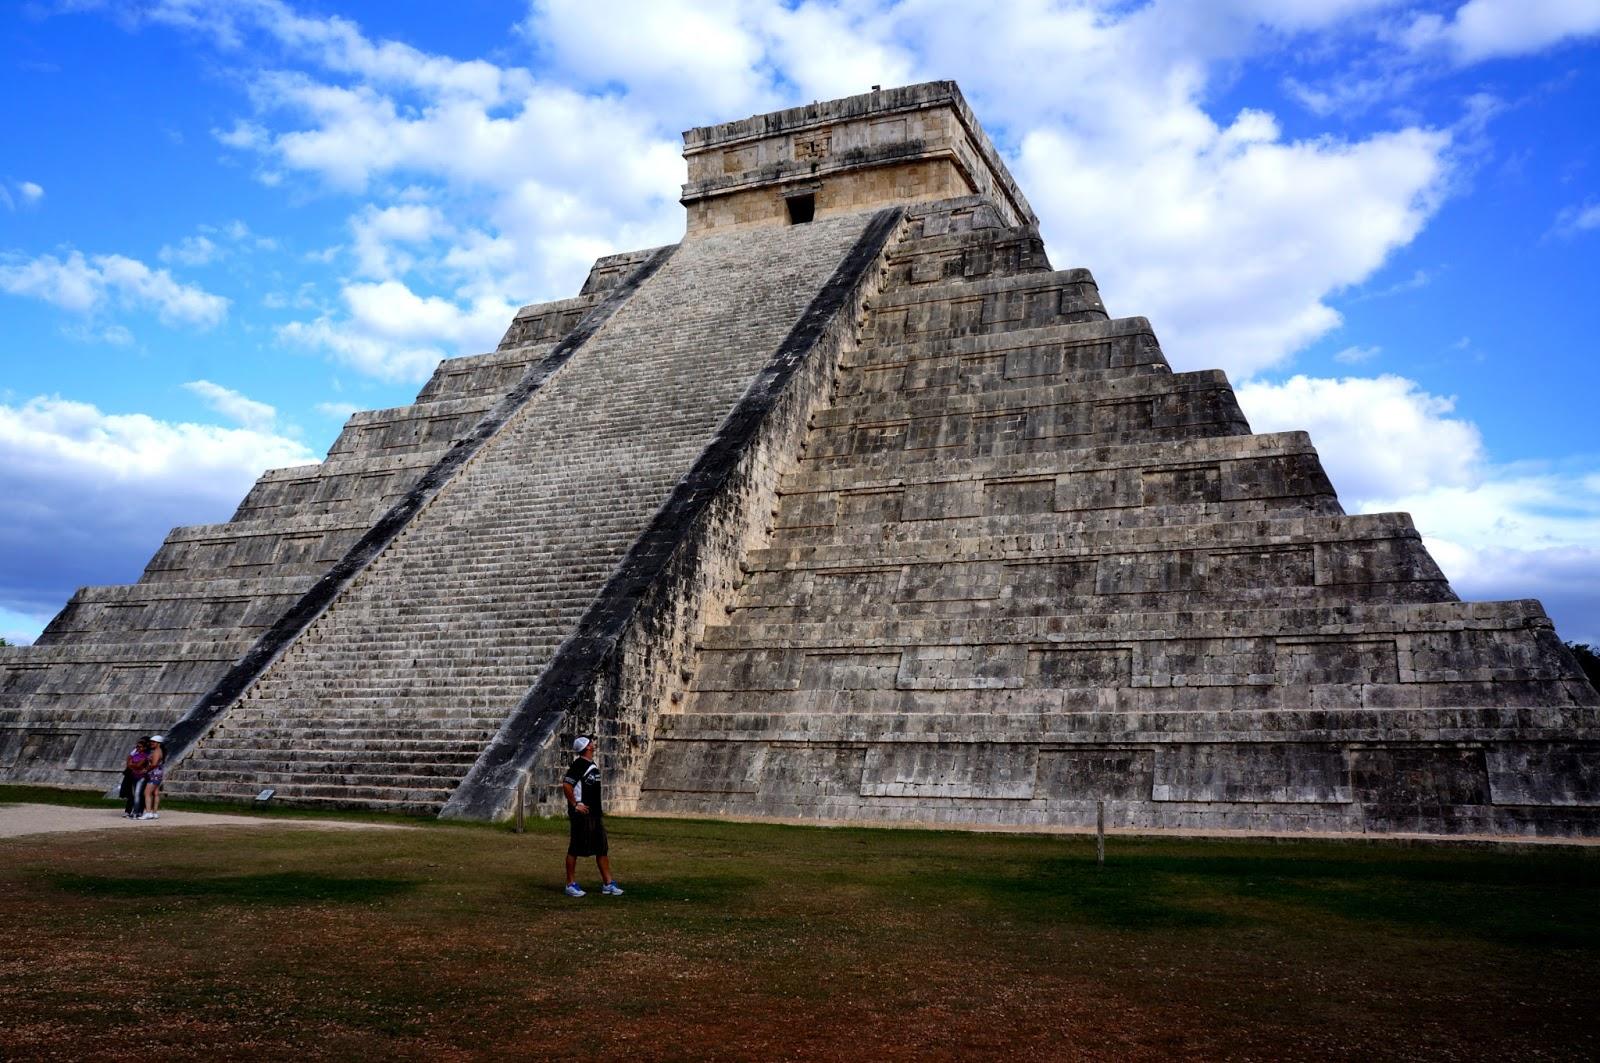 ancient mayan ruins chichen itza mexico wallpapers - Ancient Mayan Ruins Chichen Itza Mexico For Desktop